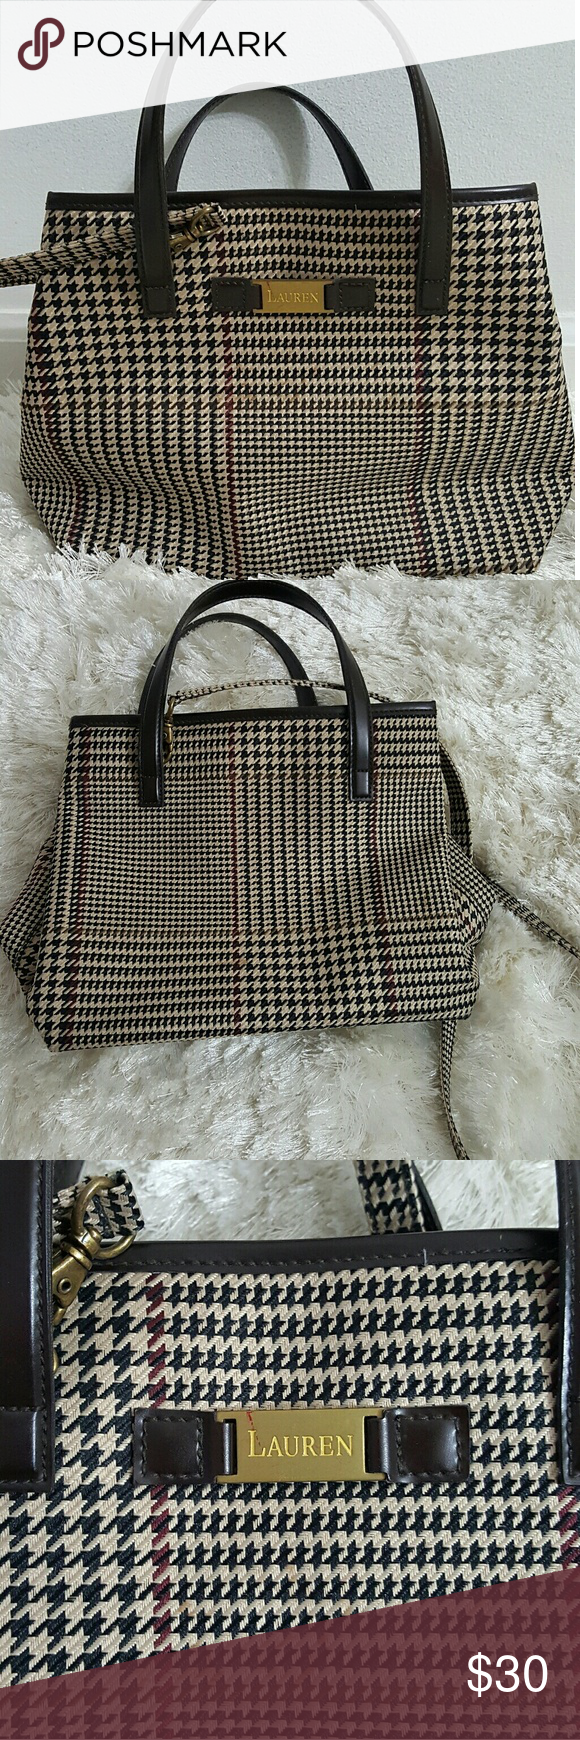 cb4cbd7b4fe Spotted while shopping on Poshmark  Vintage Ralph Lauren purse!  poshmark   fashion  shopping  style  Lauren Ralph Lauren  Handbags